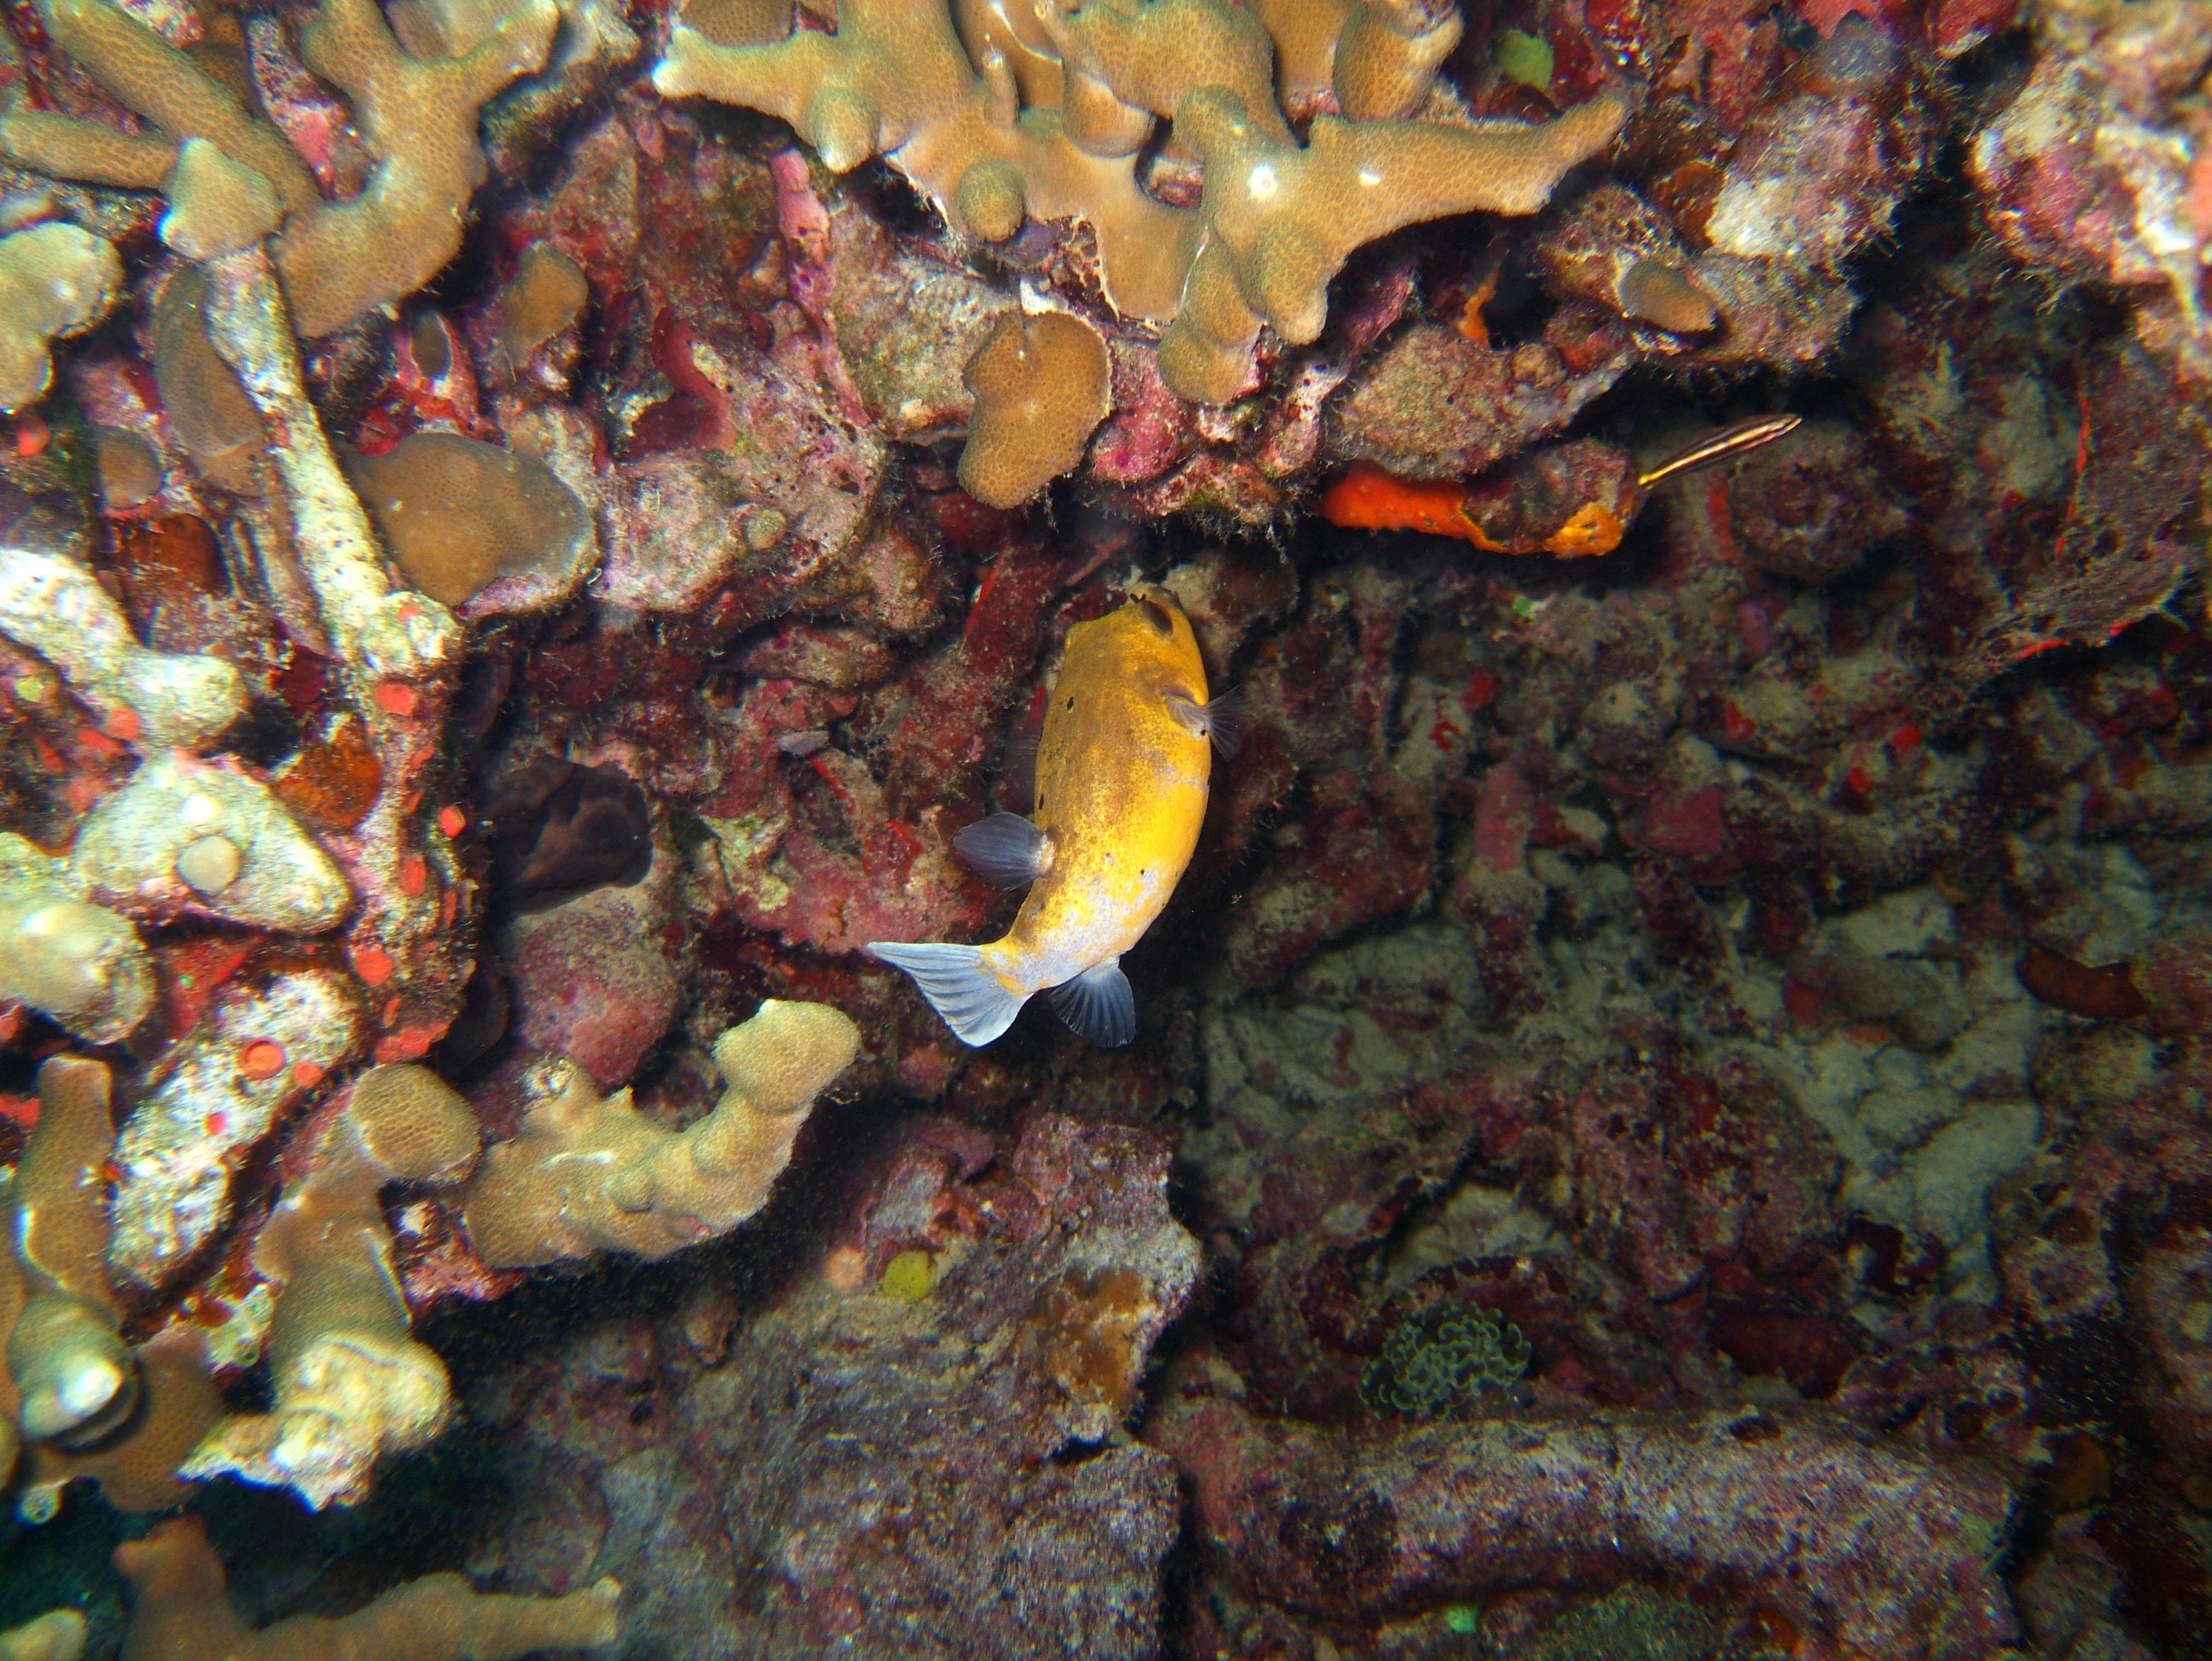 Coron dive site 11 Cay Angan Lake Baracuda Lake Reef July 2005 25